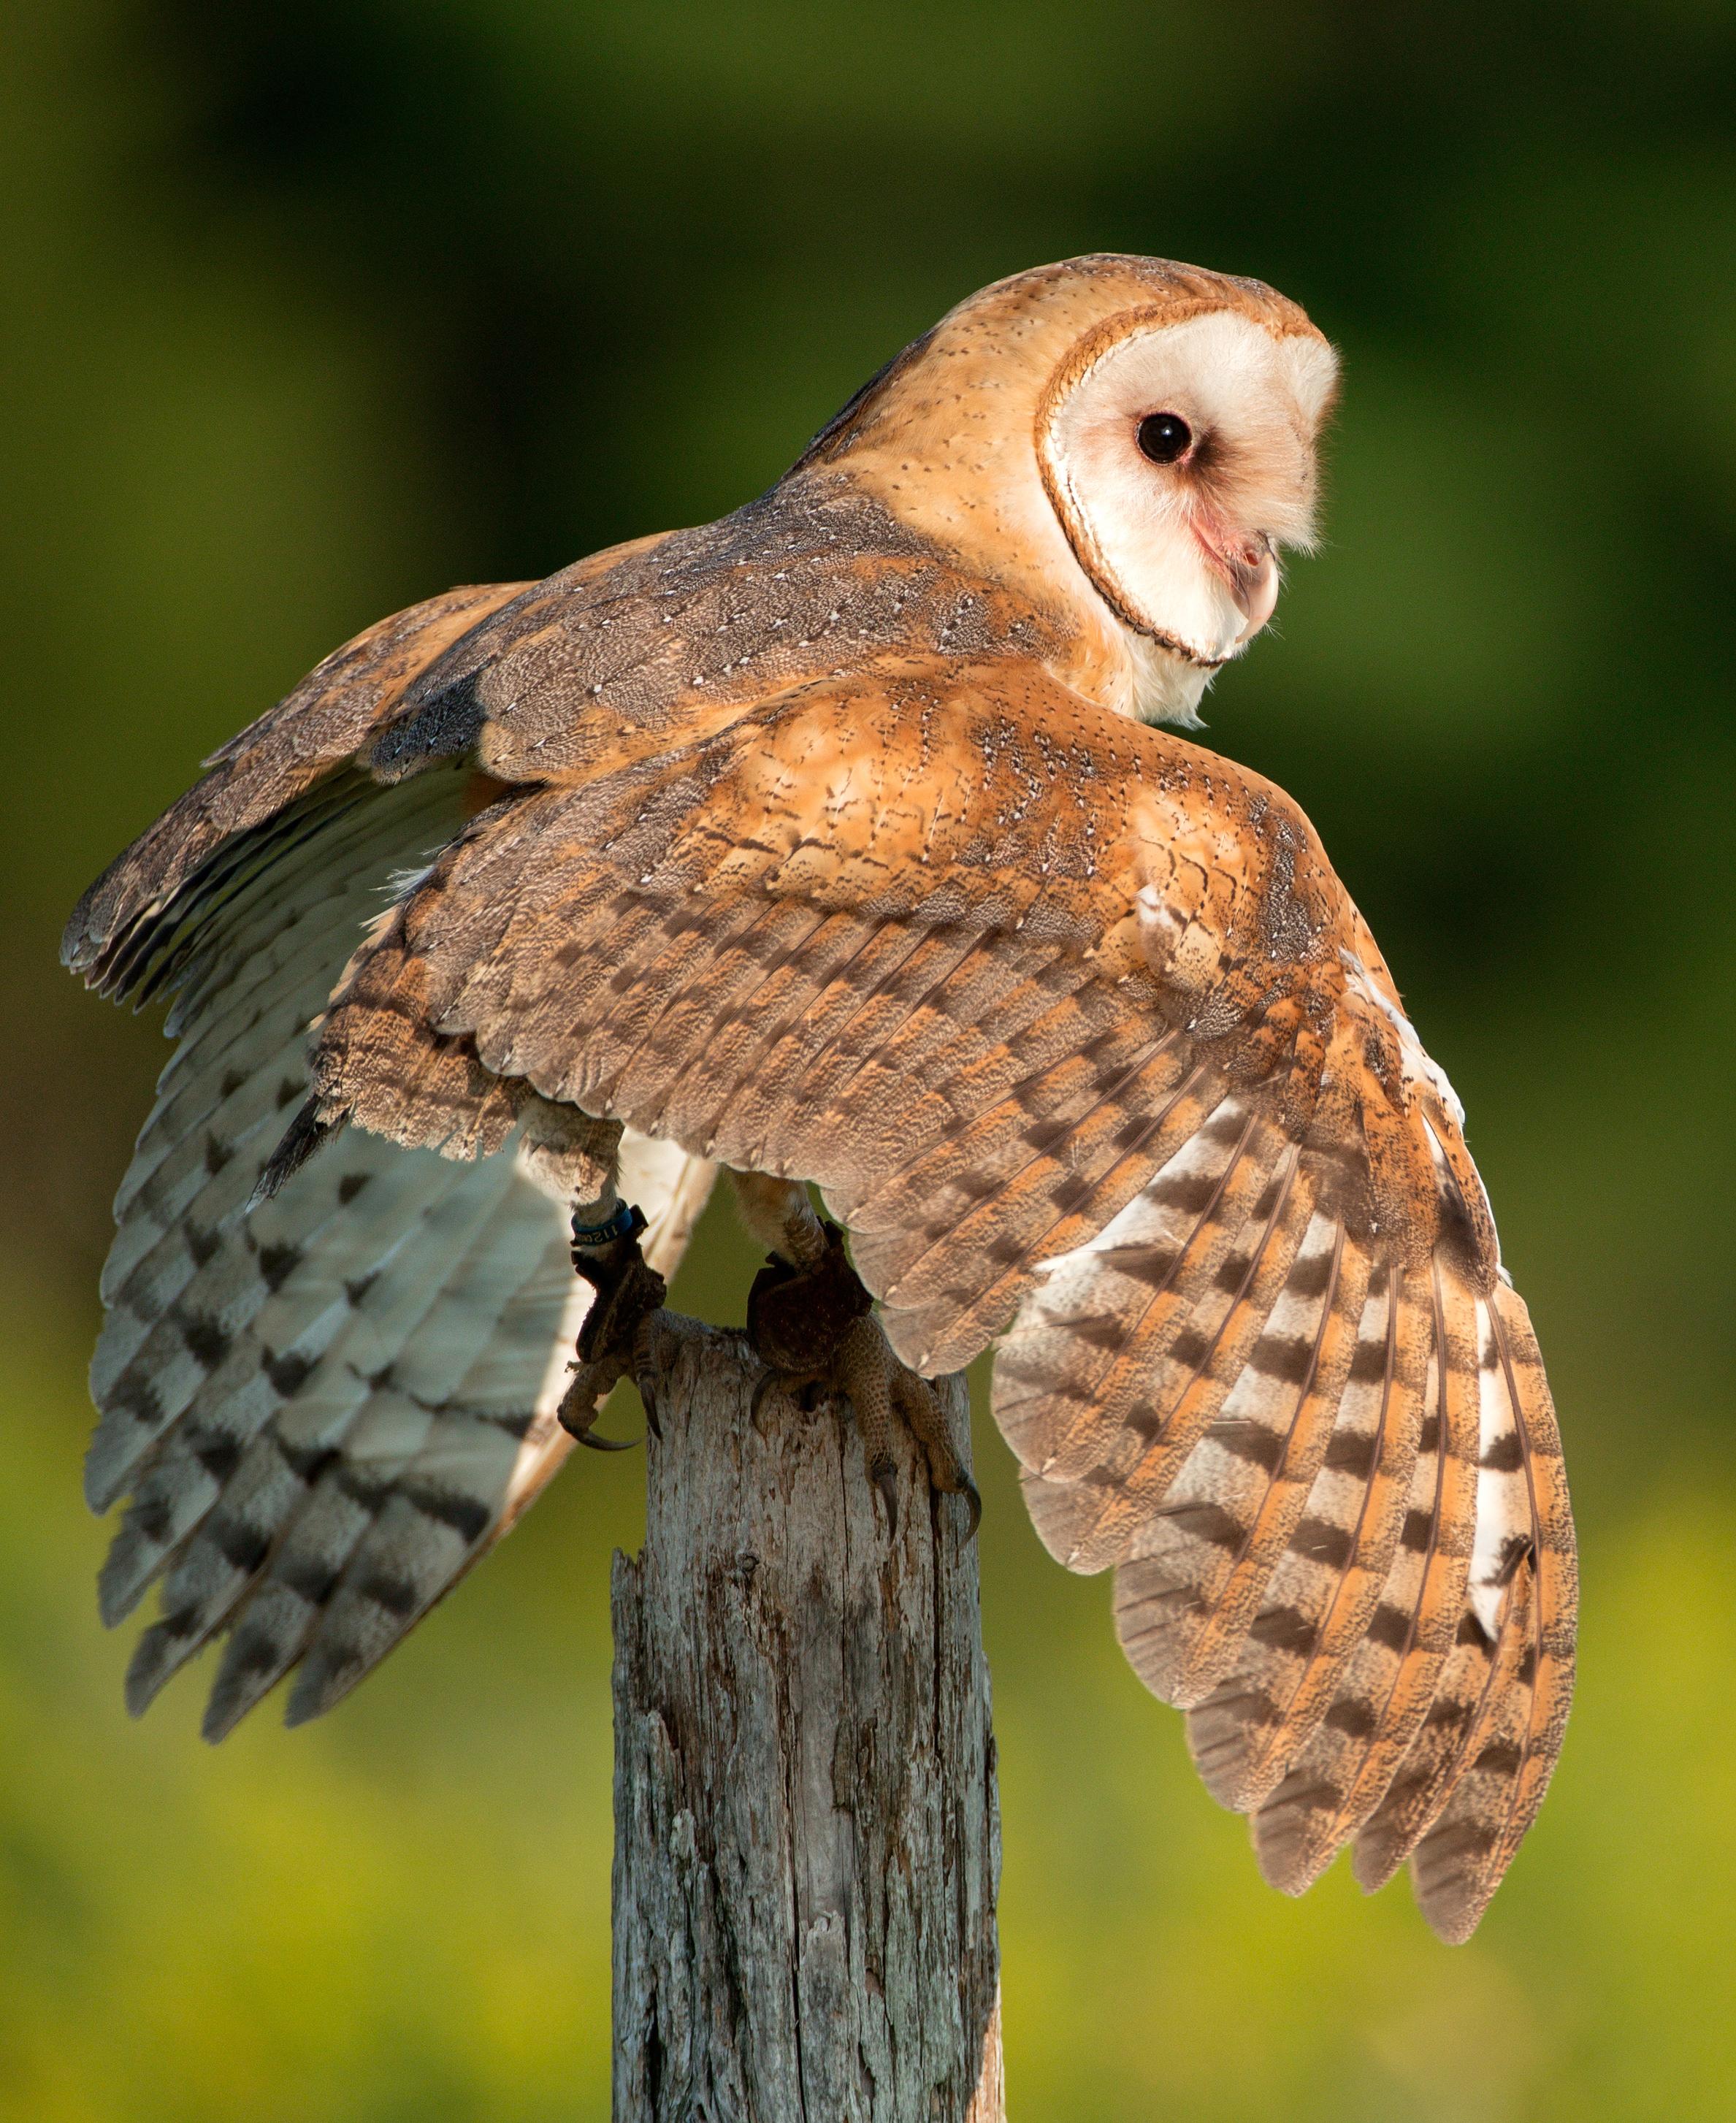 File:Barn Owl, Canada.jpg - Wikimedia Commons